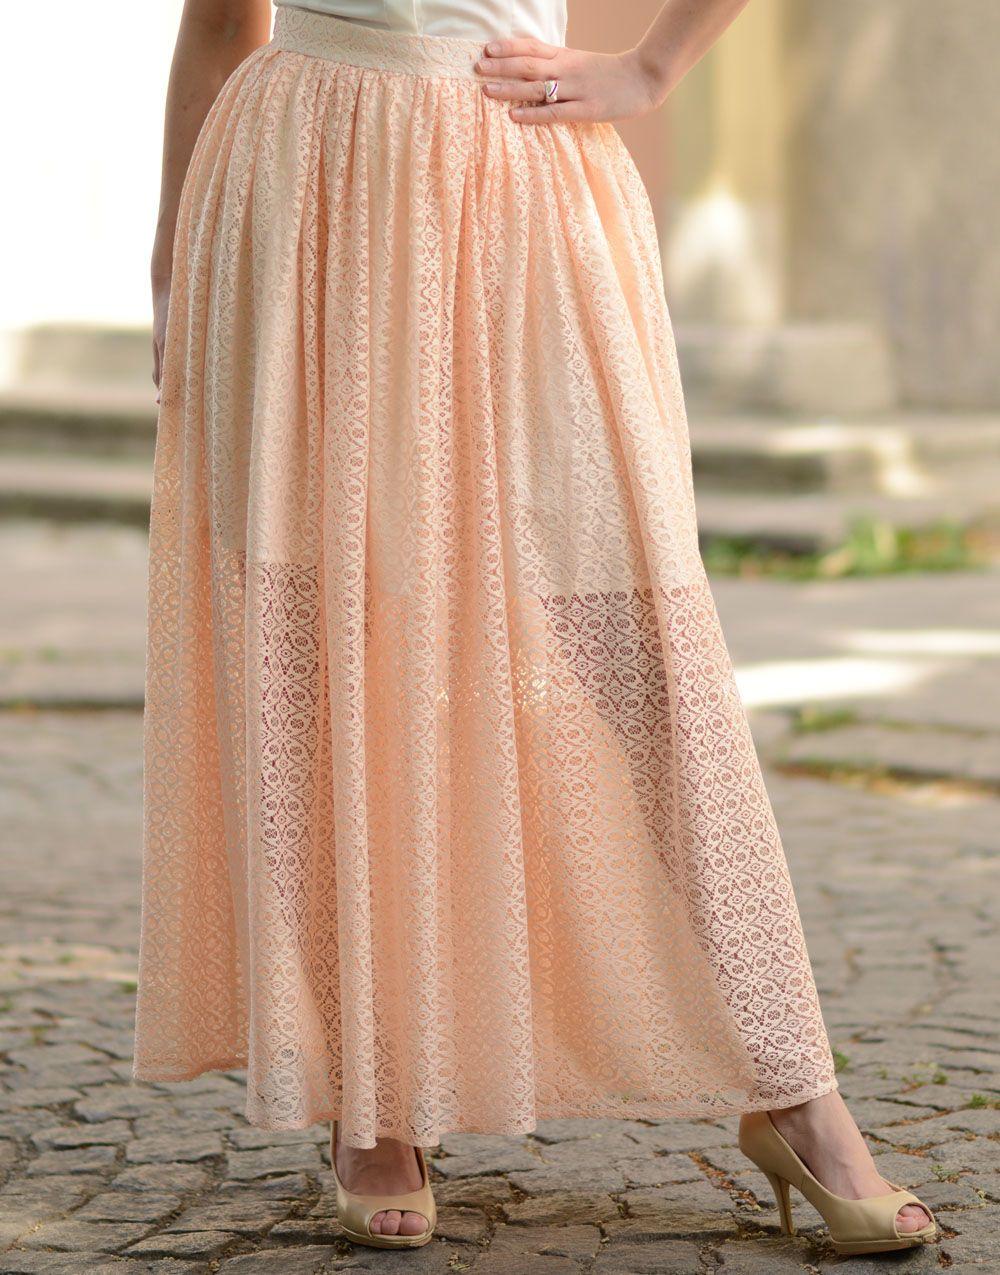 dd27d703218 Long Lace Skirt